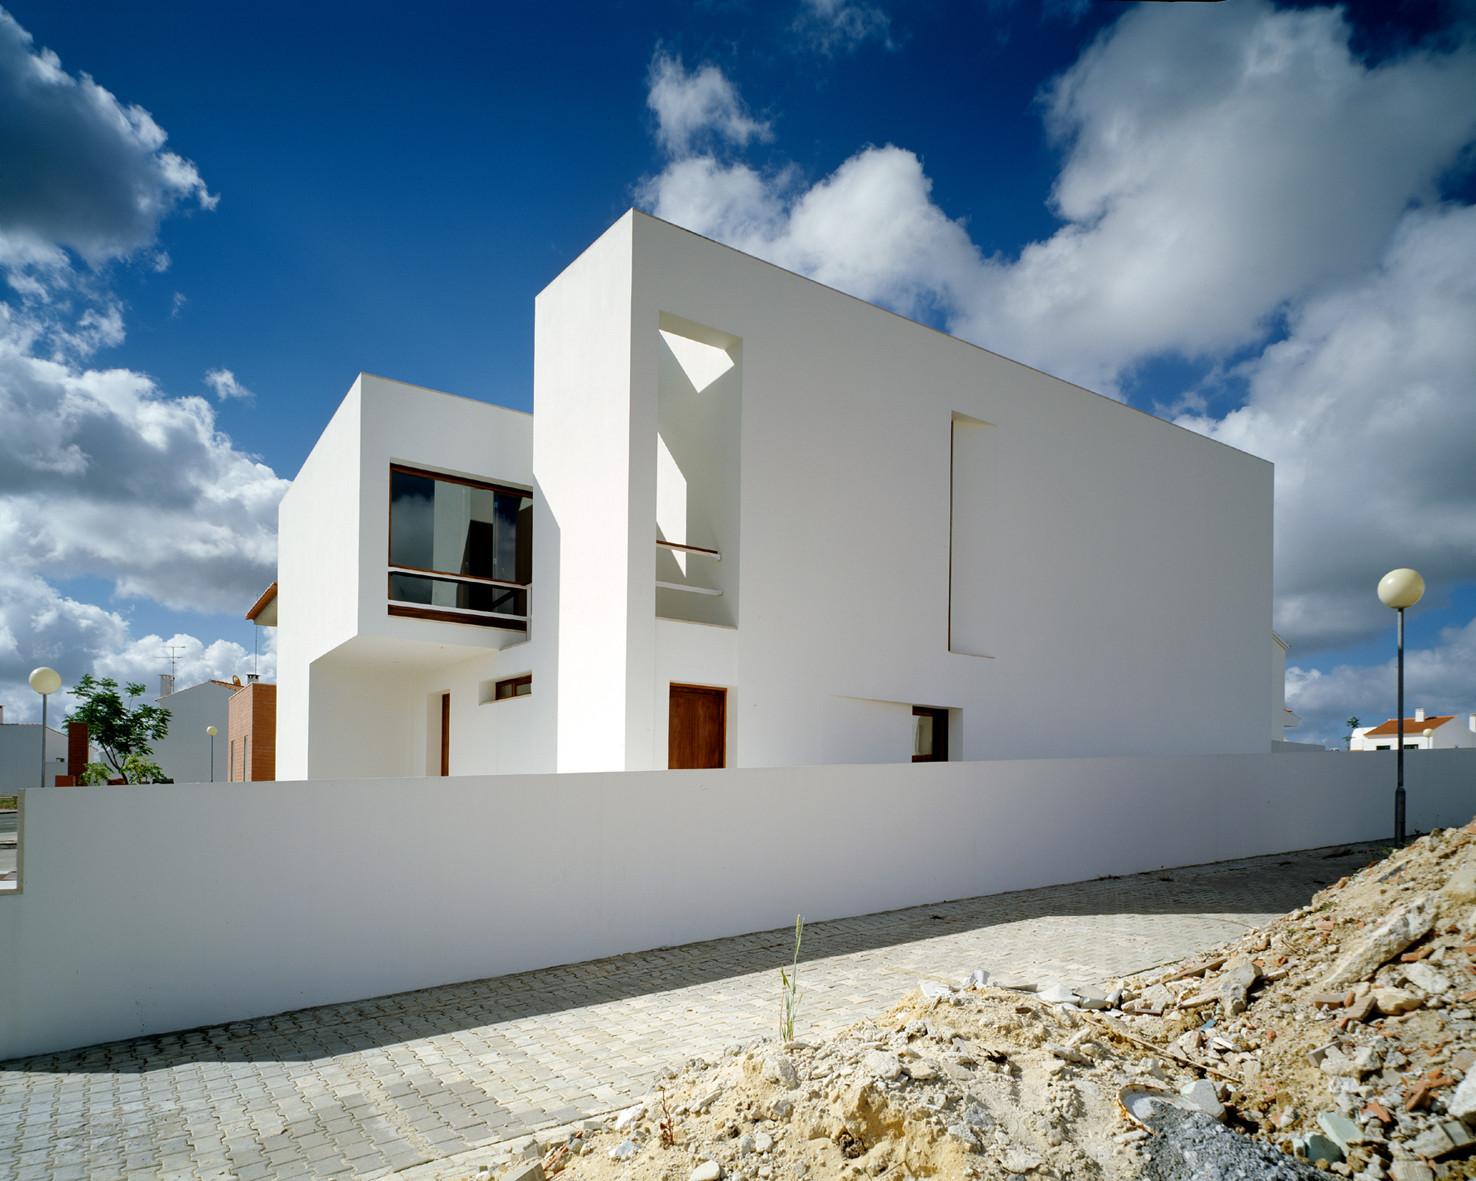 Casa en Grândola / ARX Portugal, © Daniel Malhão